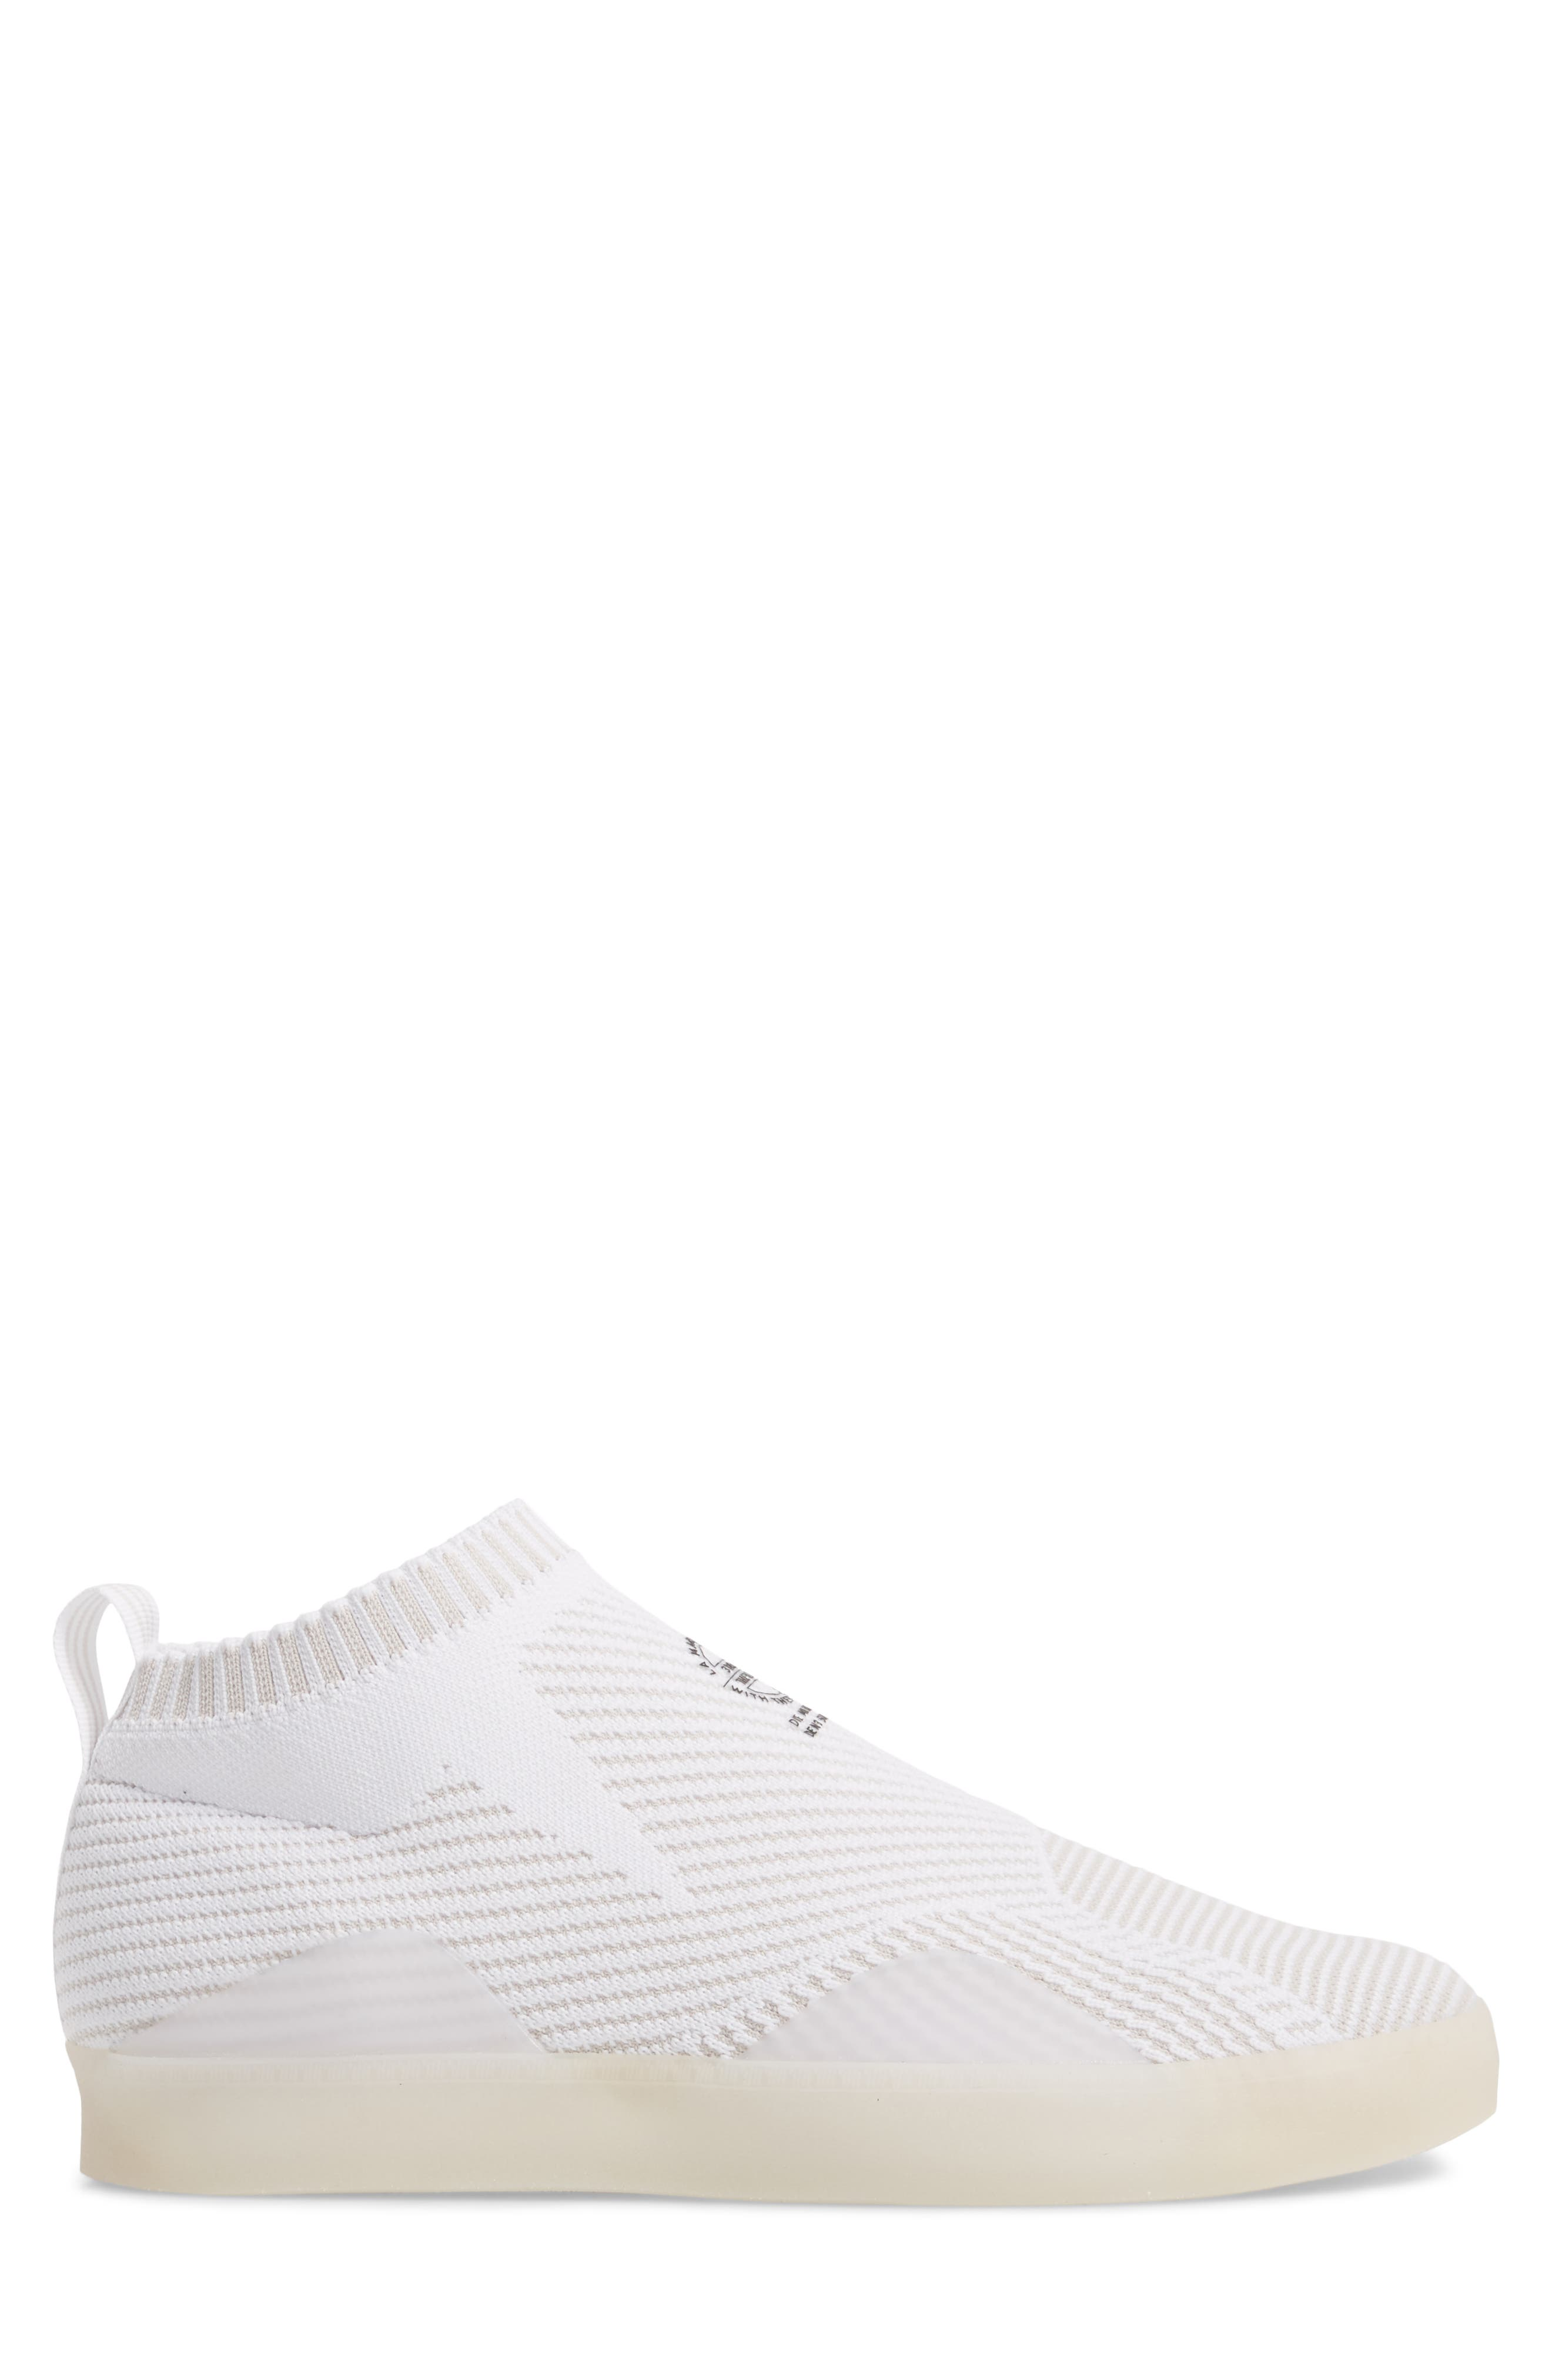 3ST.002 Primeknit Skateboarding Shoe,                             Alternate thumbnail 3, color,                             White / Grey/ Black